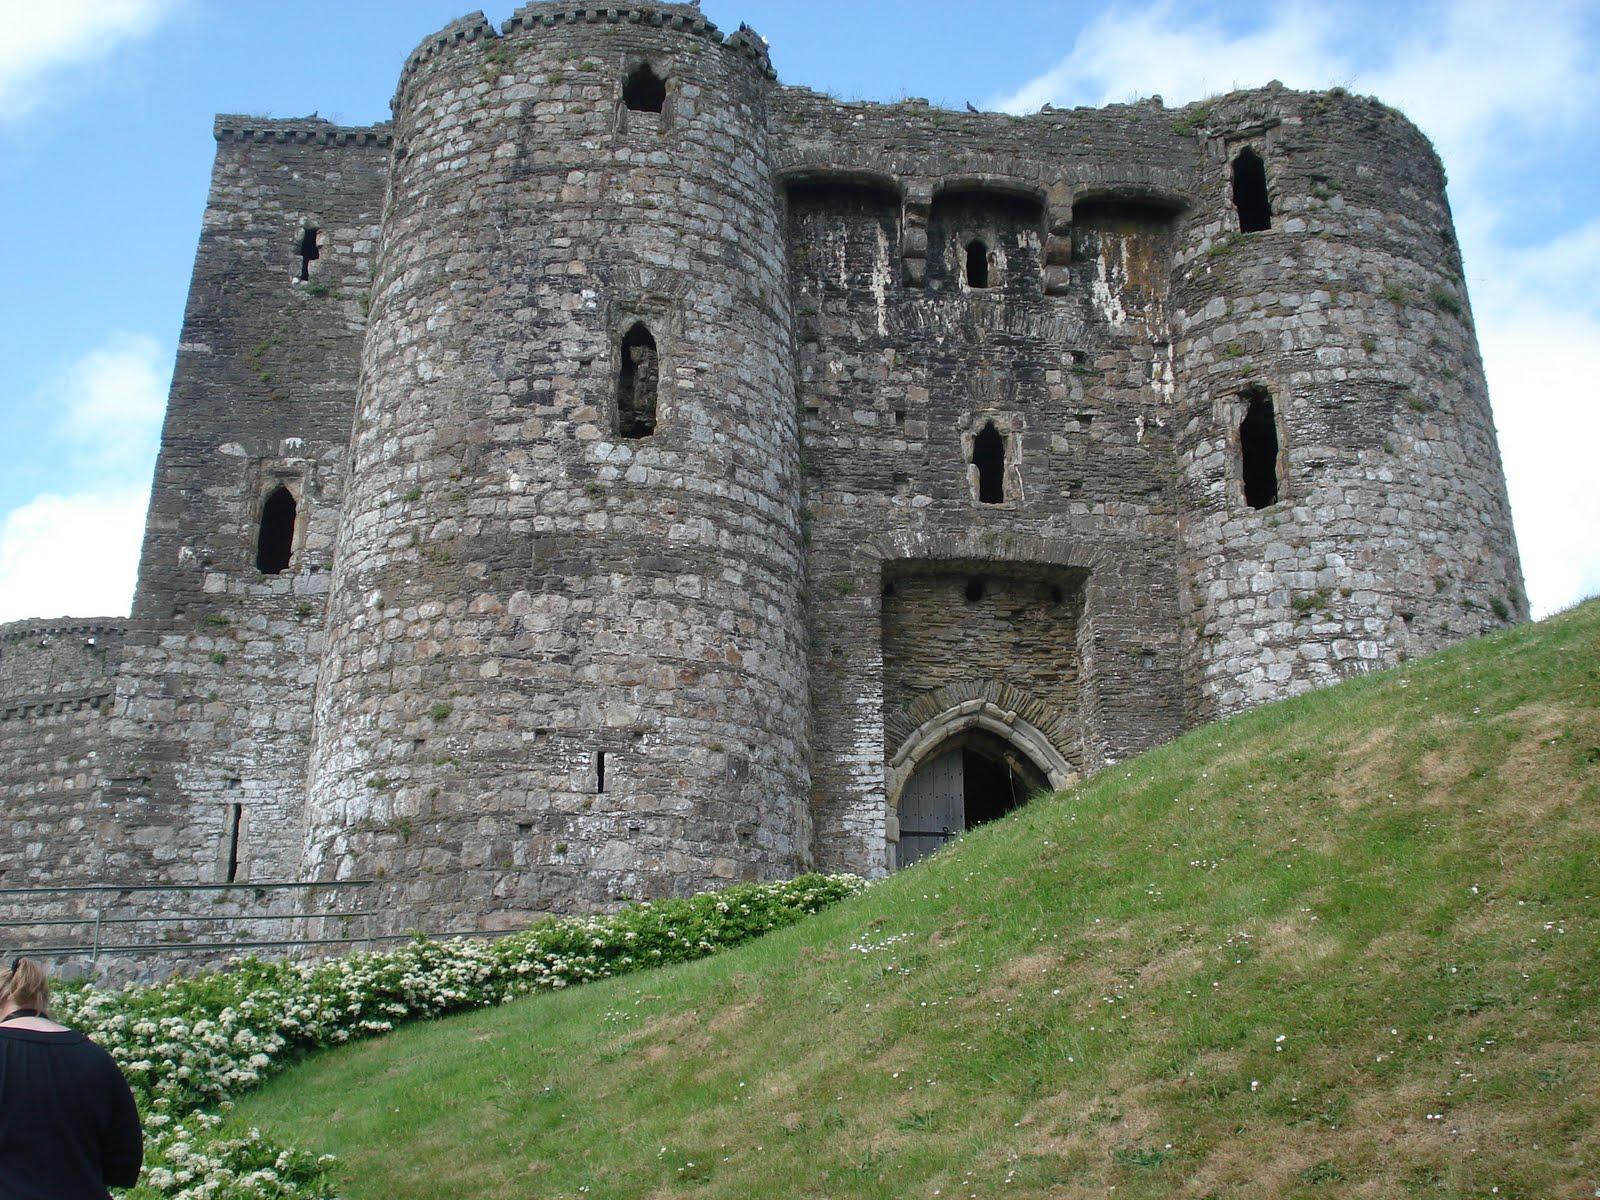 Curtain Wall Medieval Times : Judith arnopp historical novelist cydweli castle castles